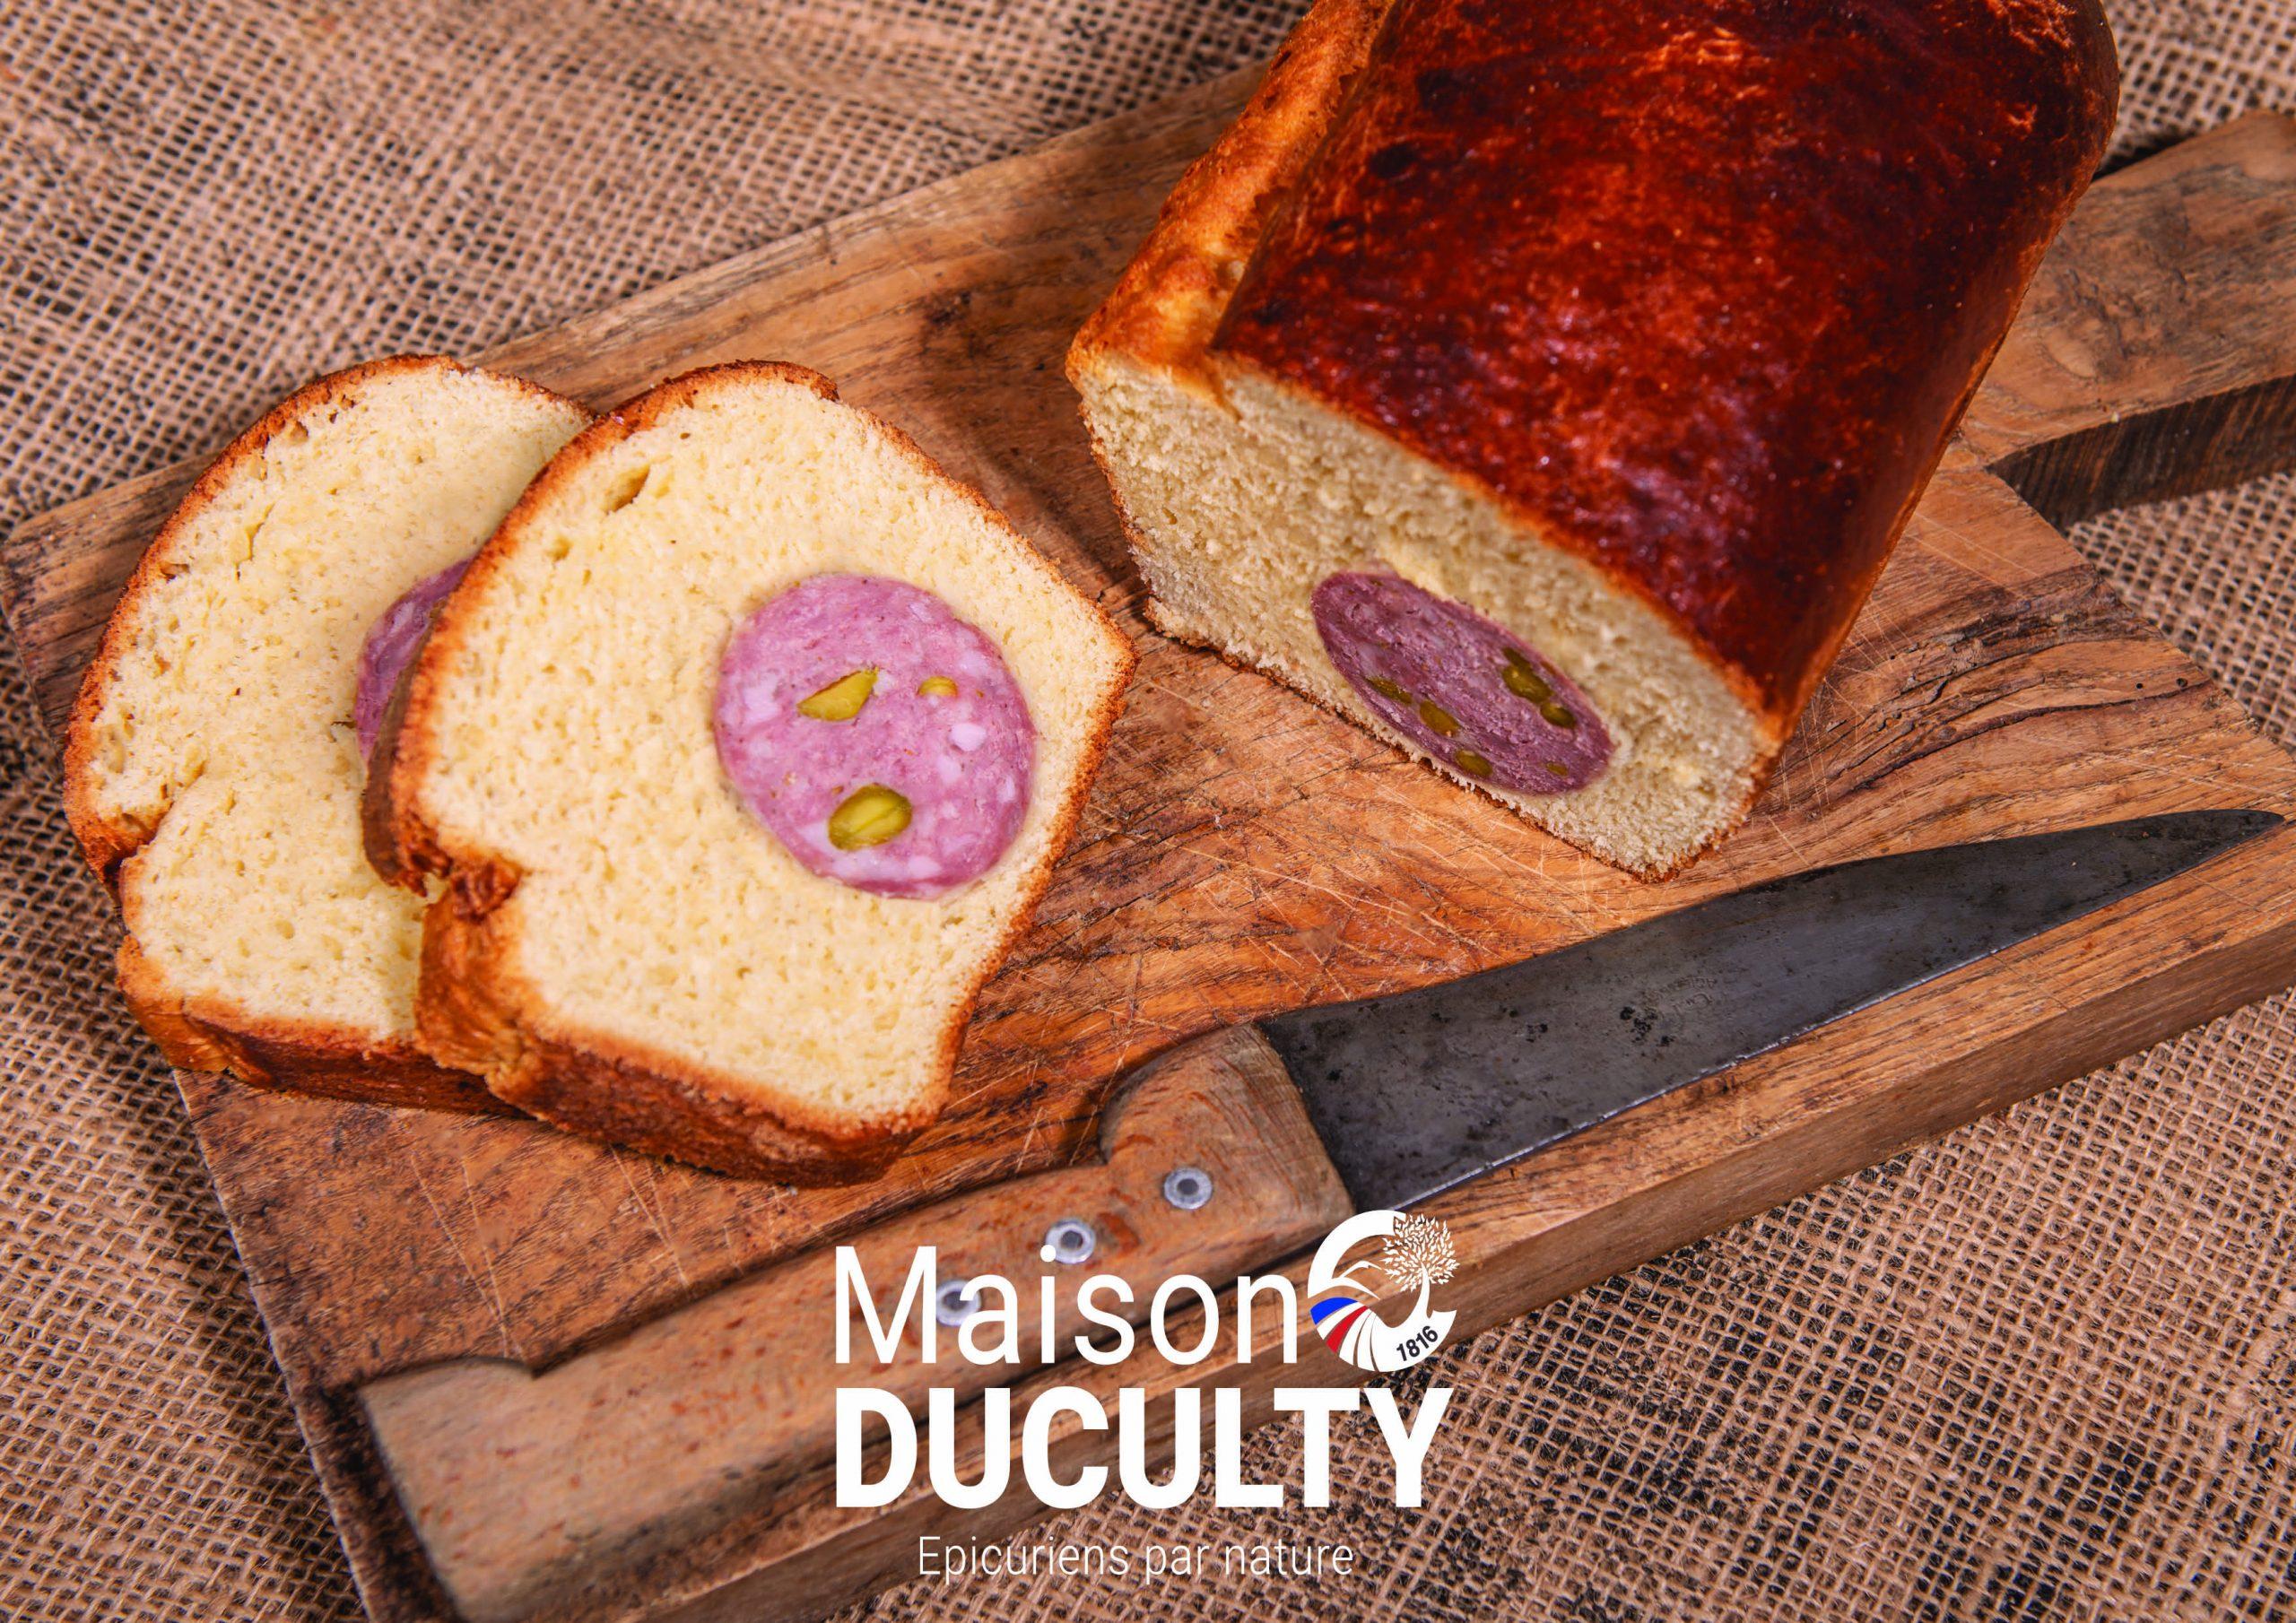 Saucisson brioché Duculty